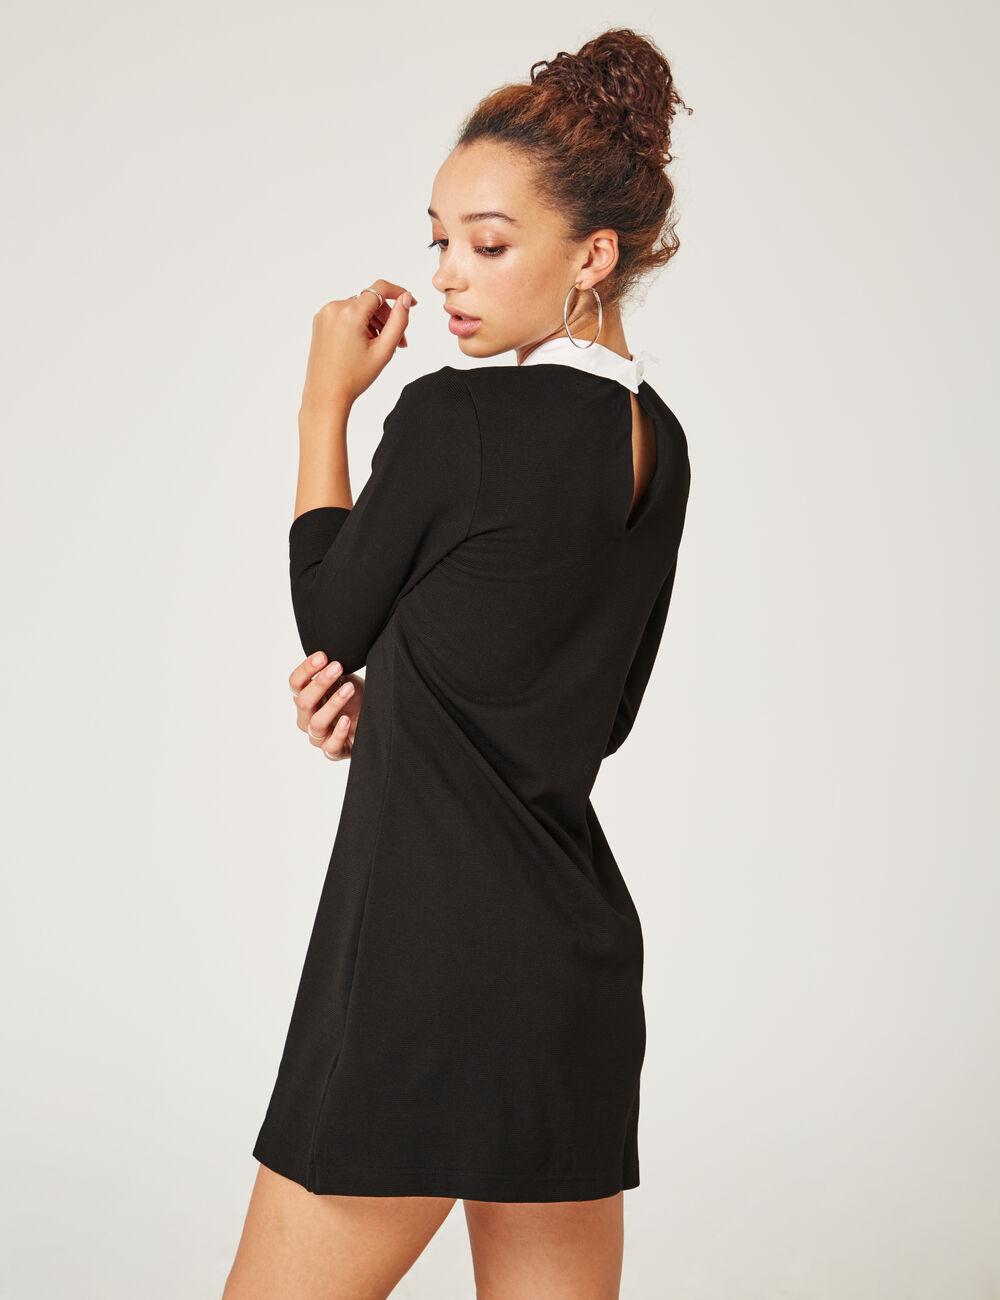 robe noire col blanc h m belle robe photo blog. Black Bedroom Furniture Sets. Home Design Ideas